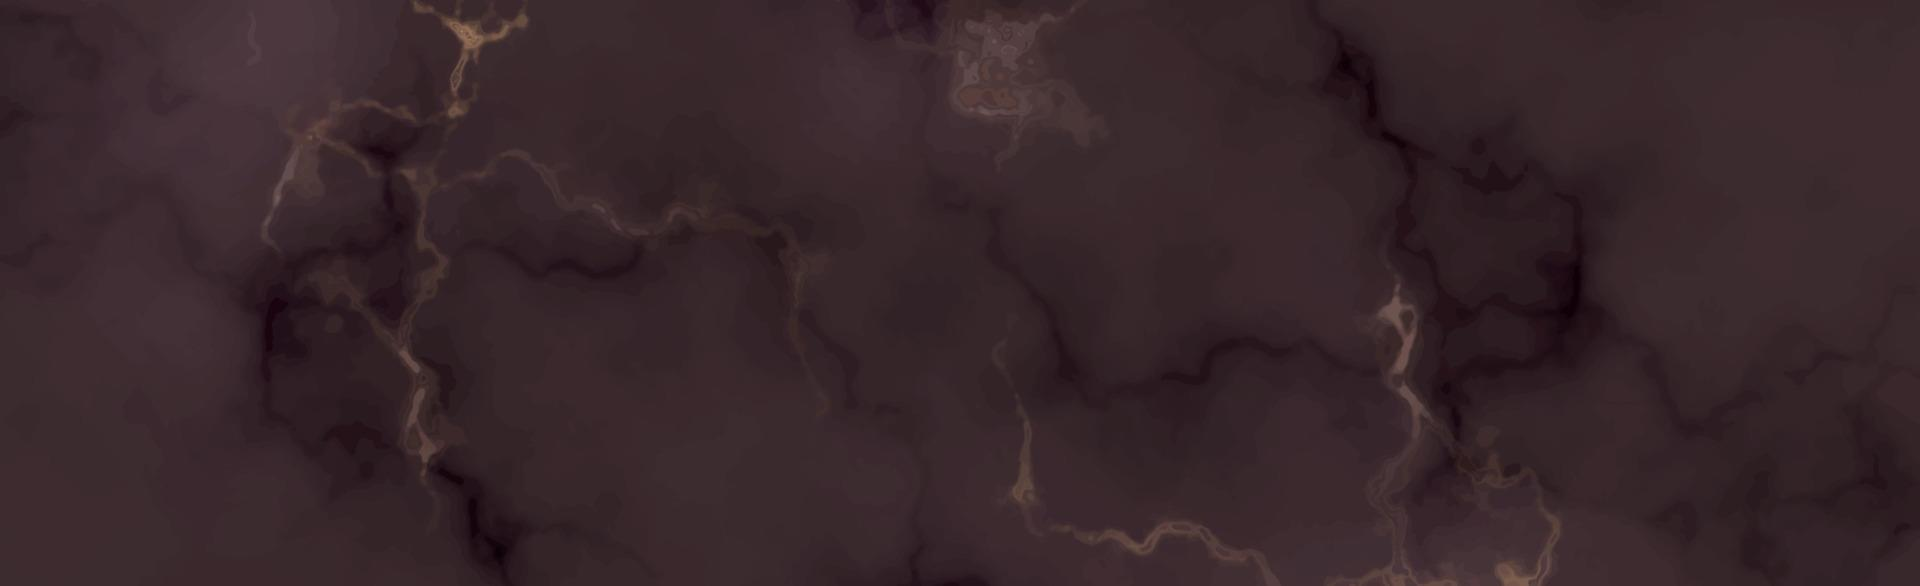 textura realista de parede panorâmica de pedra escura - vetor